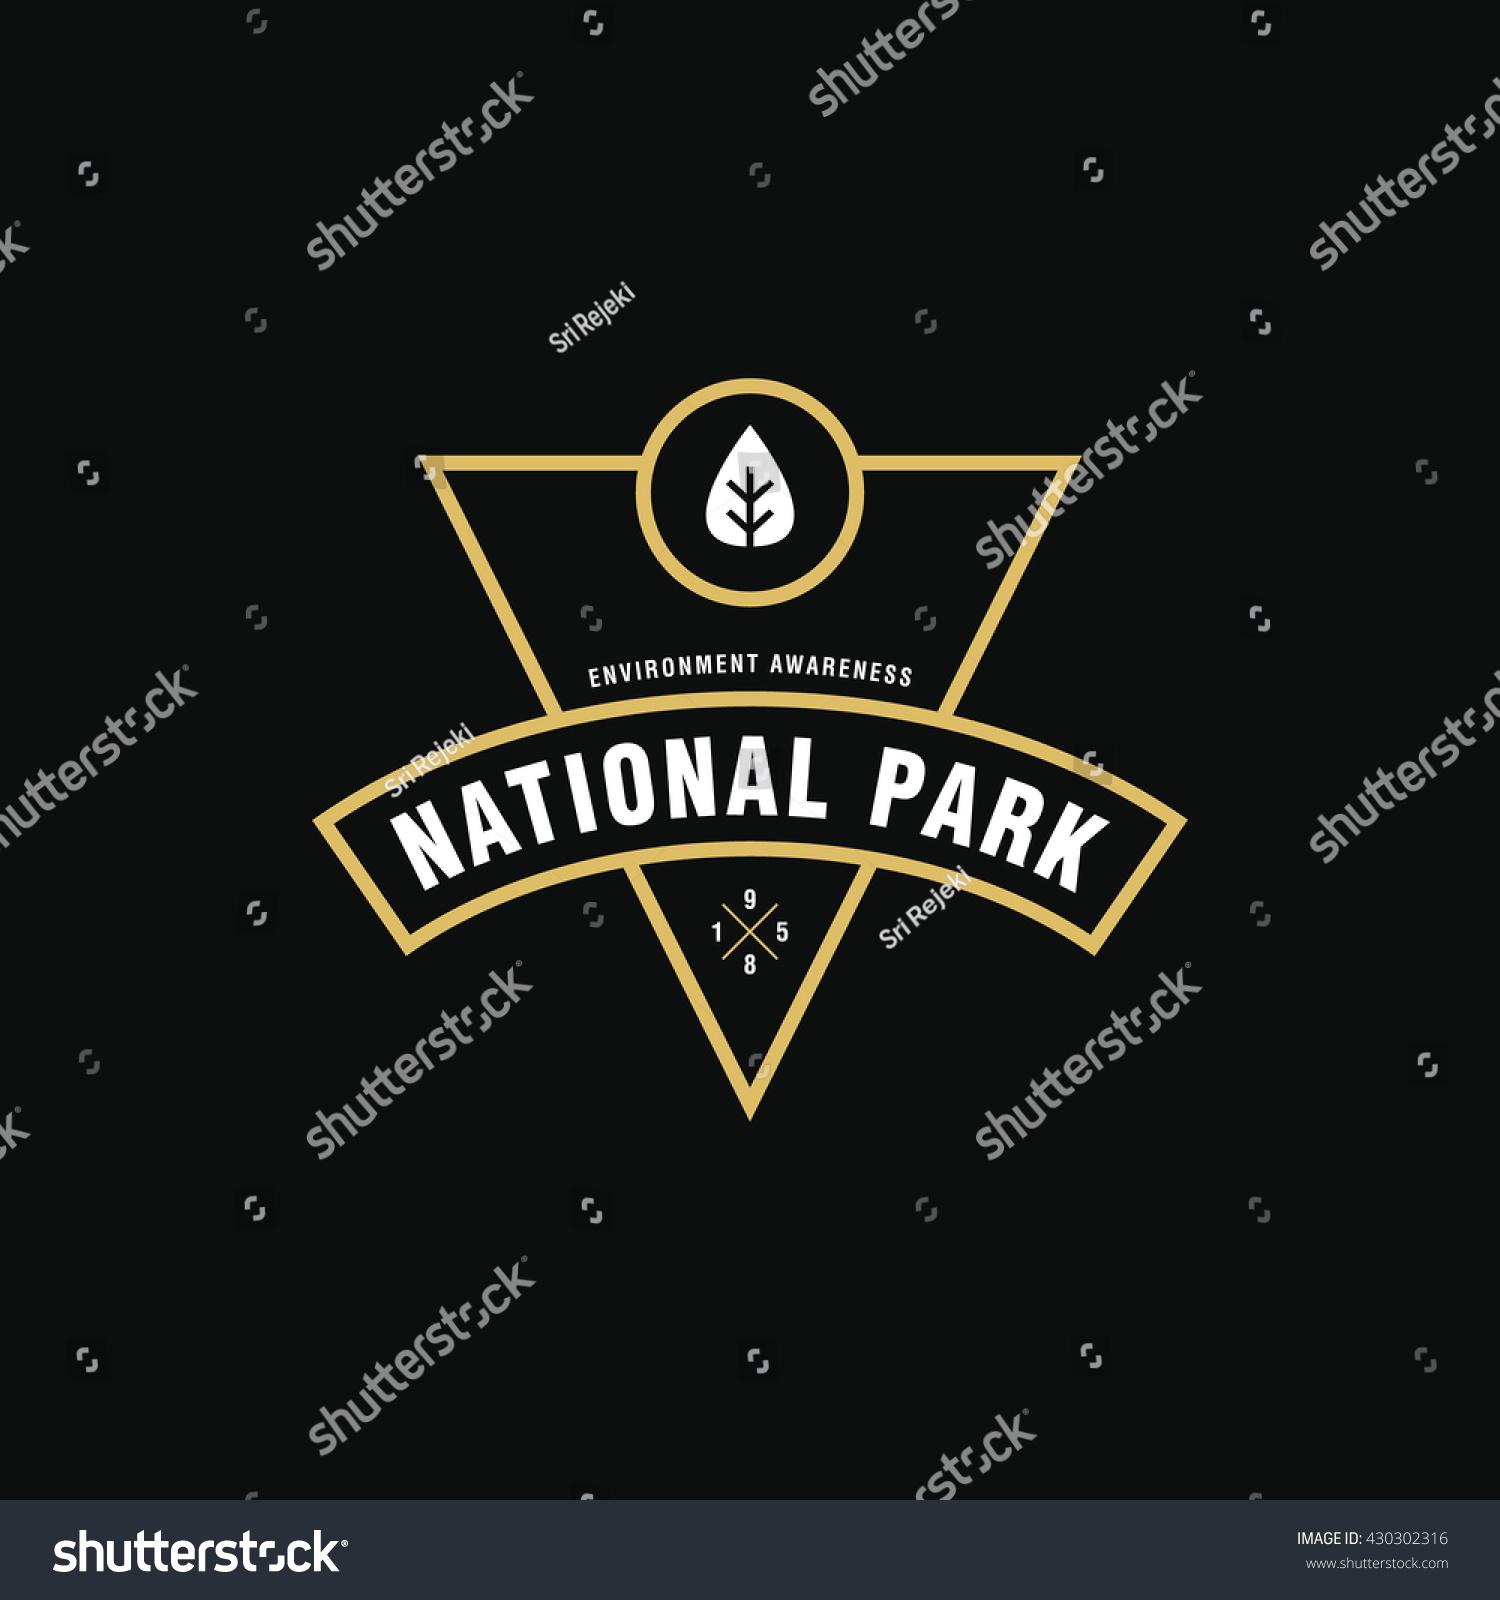 Vintage National Park Outdoor Symbol Environmental Stock Vector